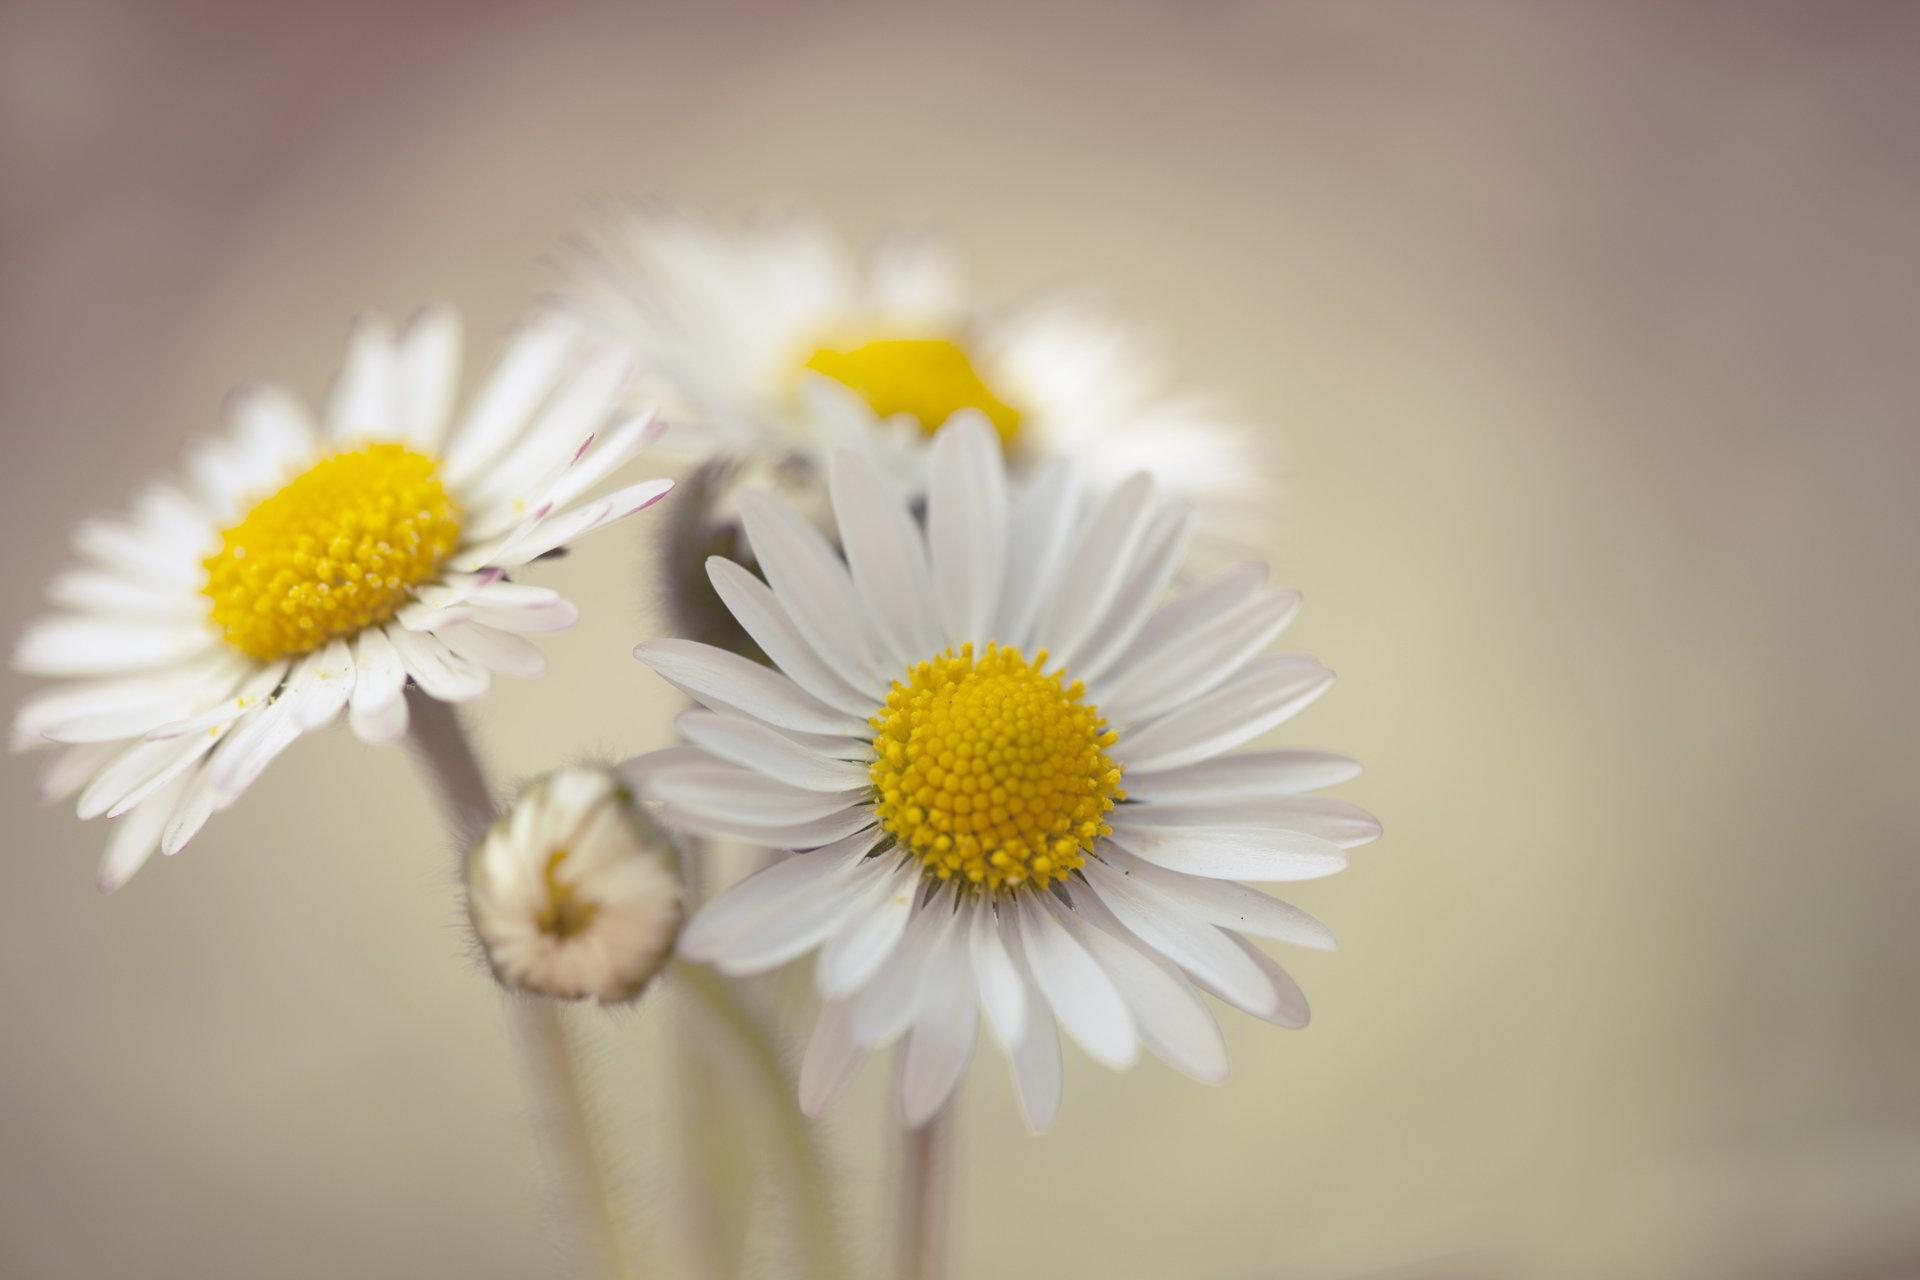 hinh anh hoa cuc dep 10